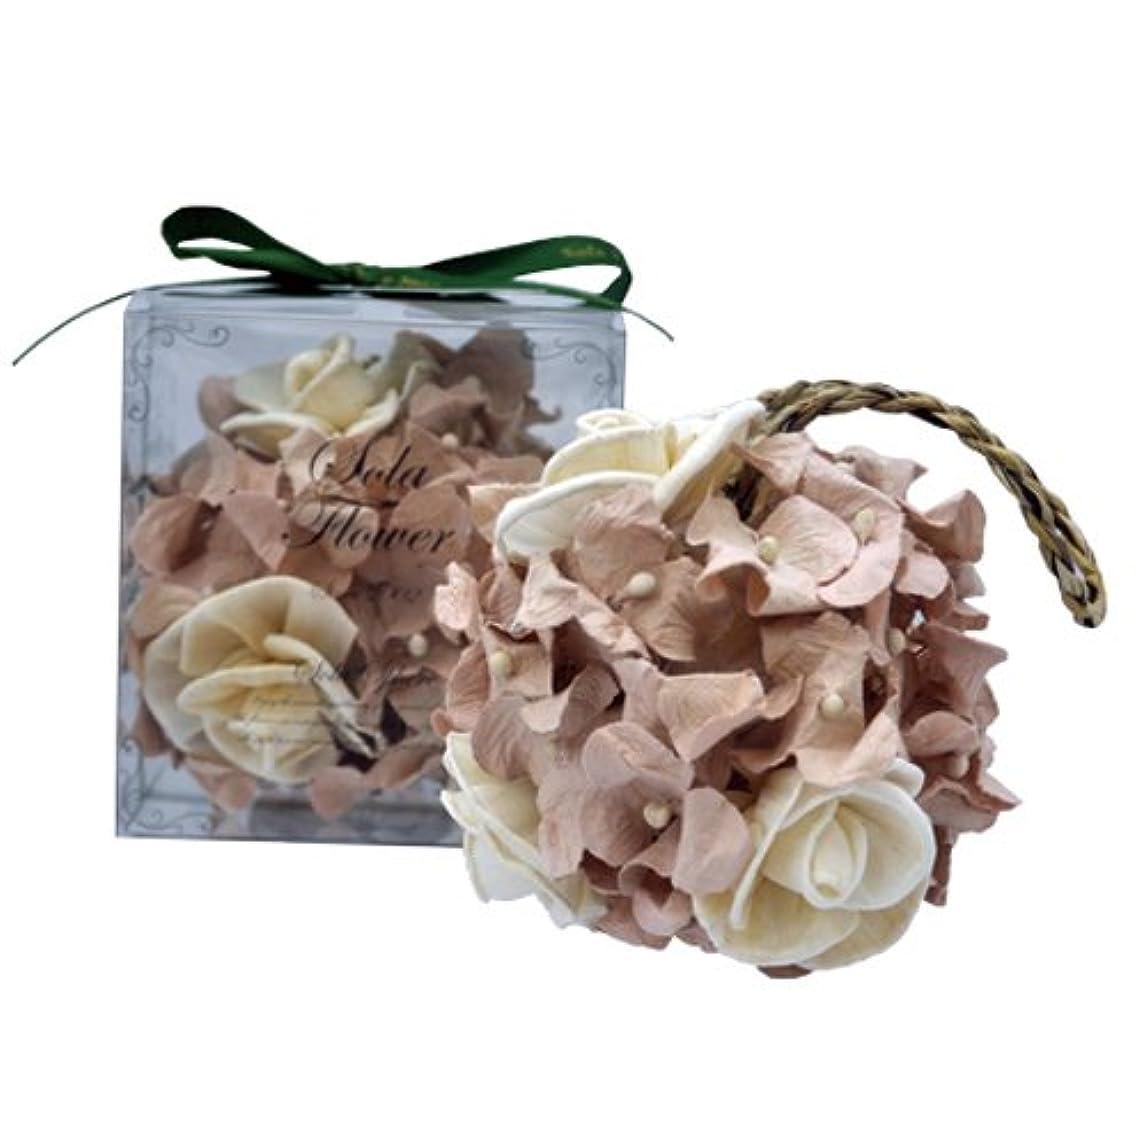 new Sola Flower ソラフラワー スフィア Gentle Rose ジェントルローズ Sphere